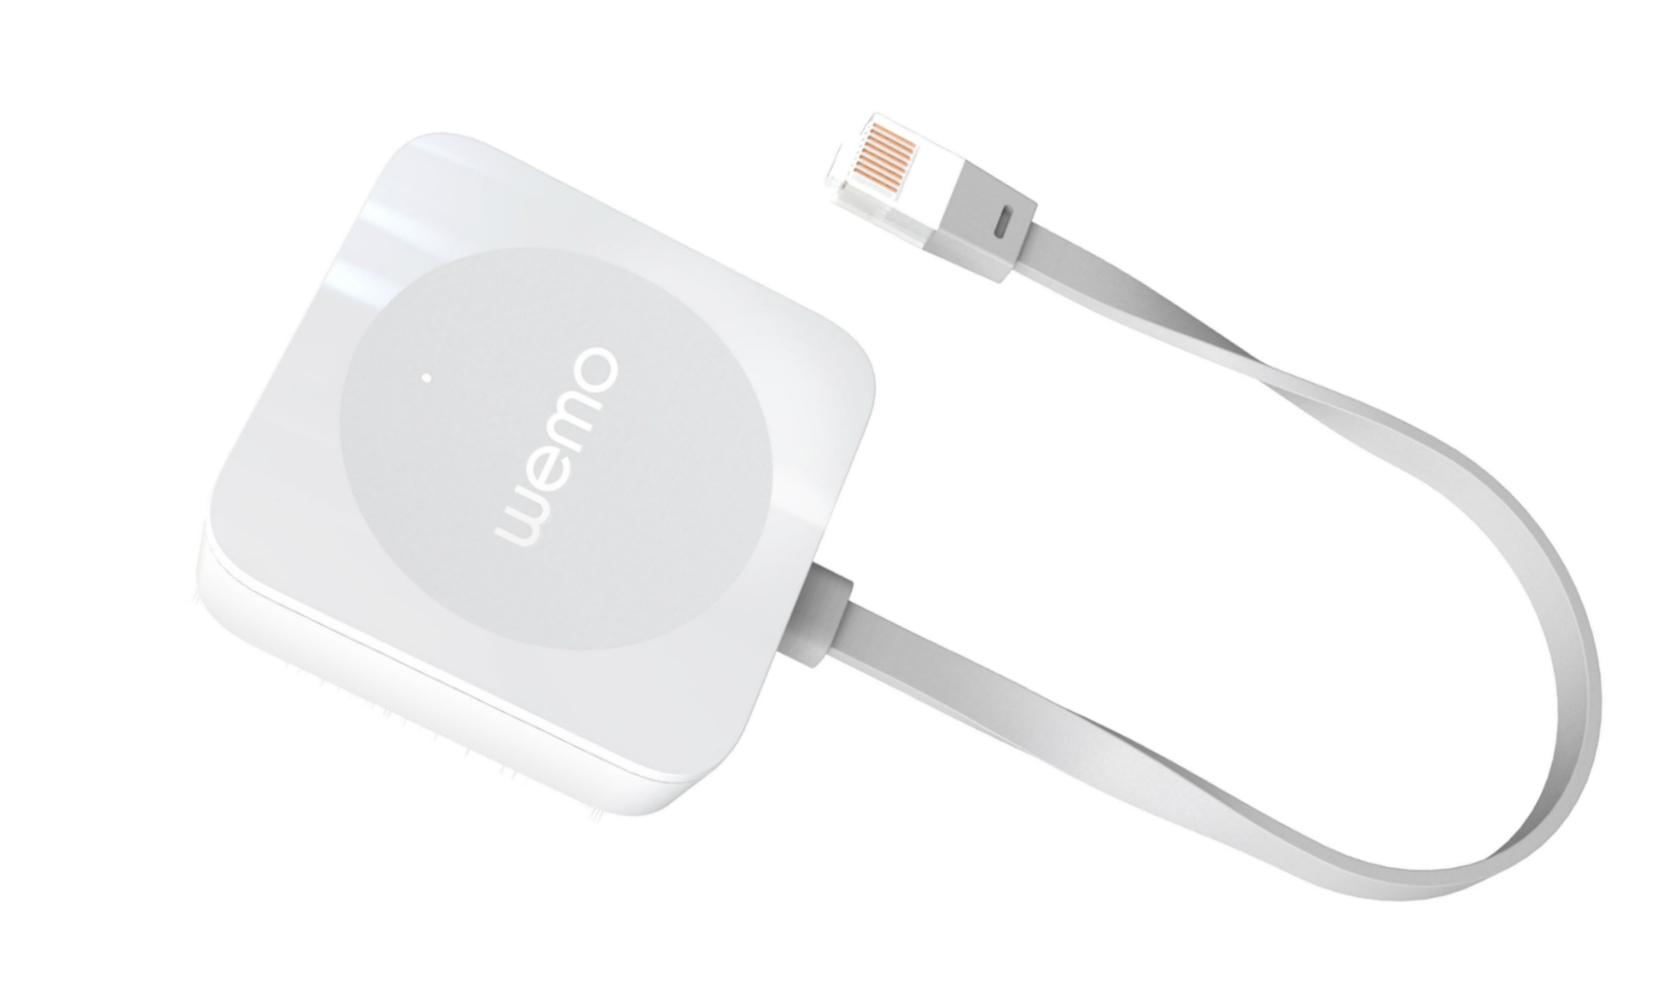 Wemo Bridge with Mini Smart Plug